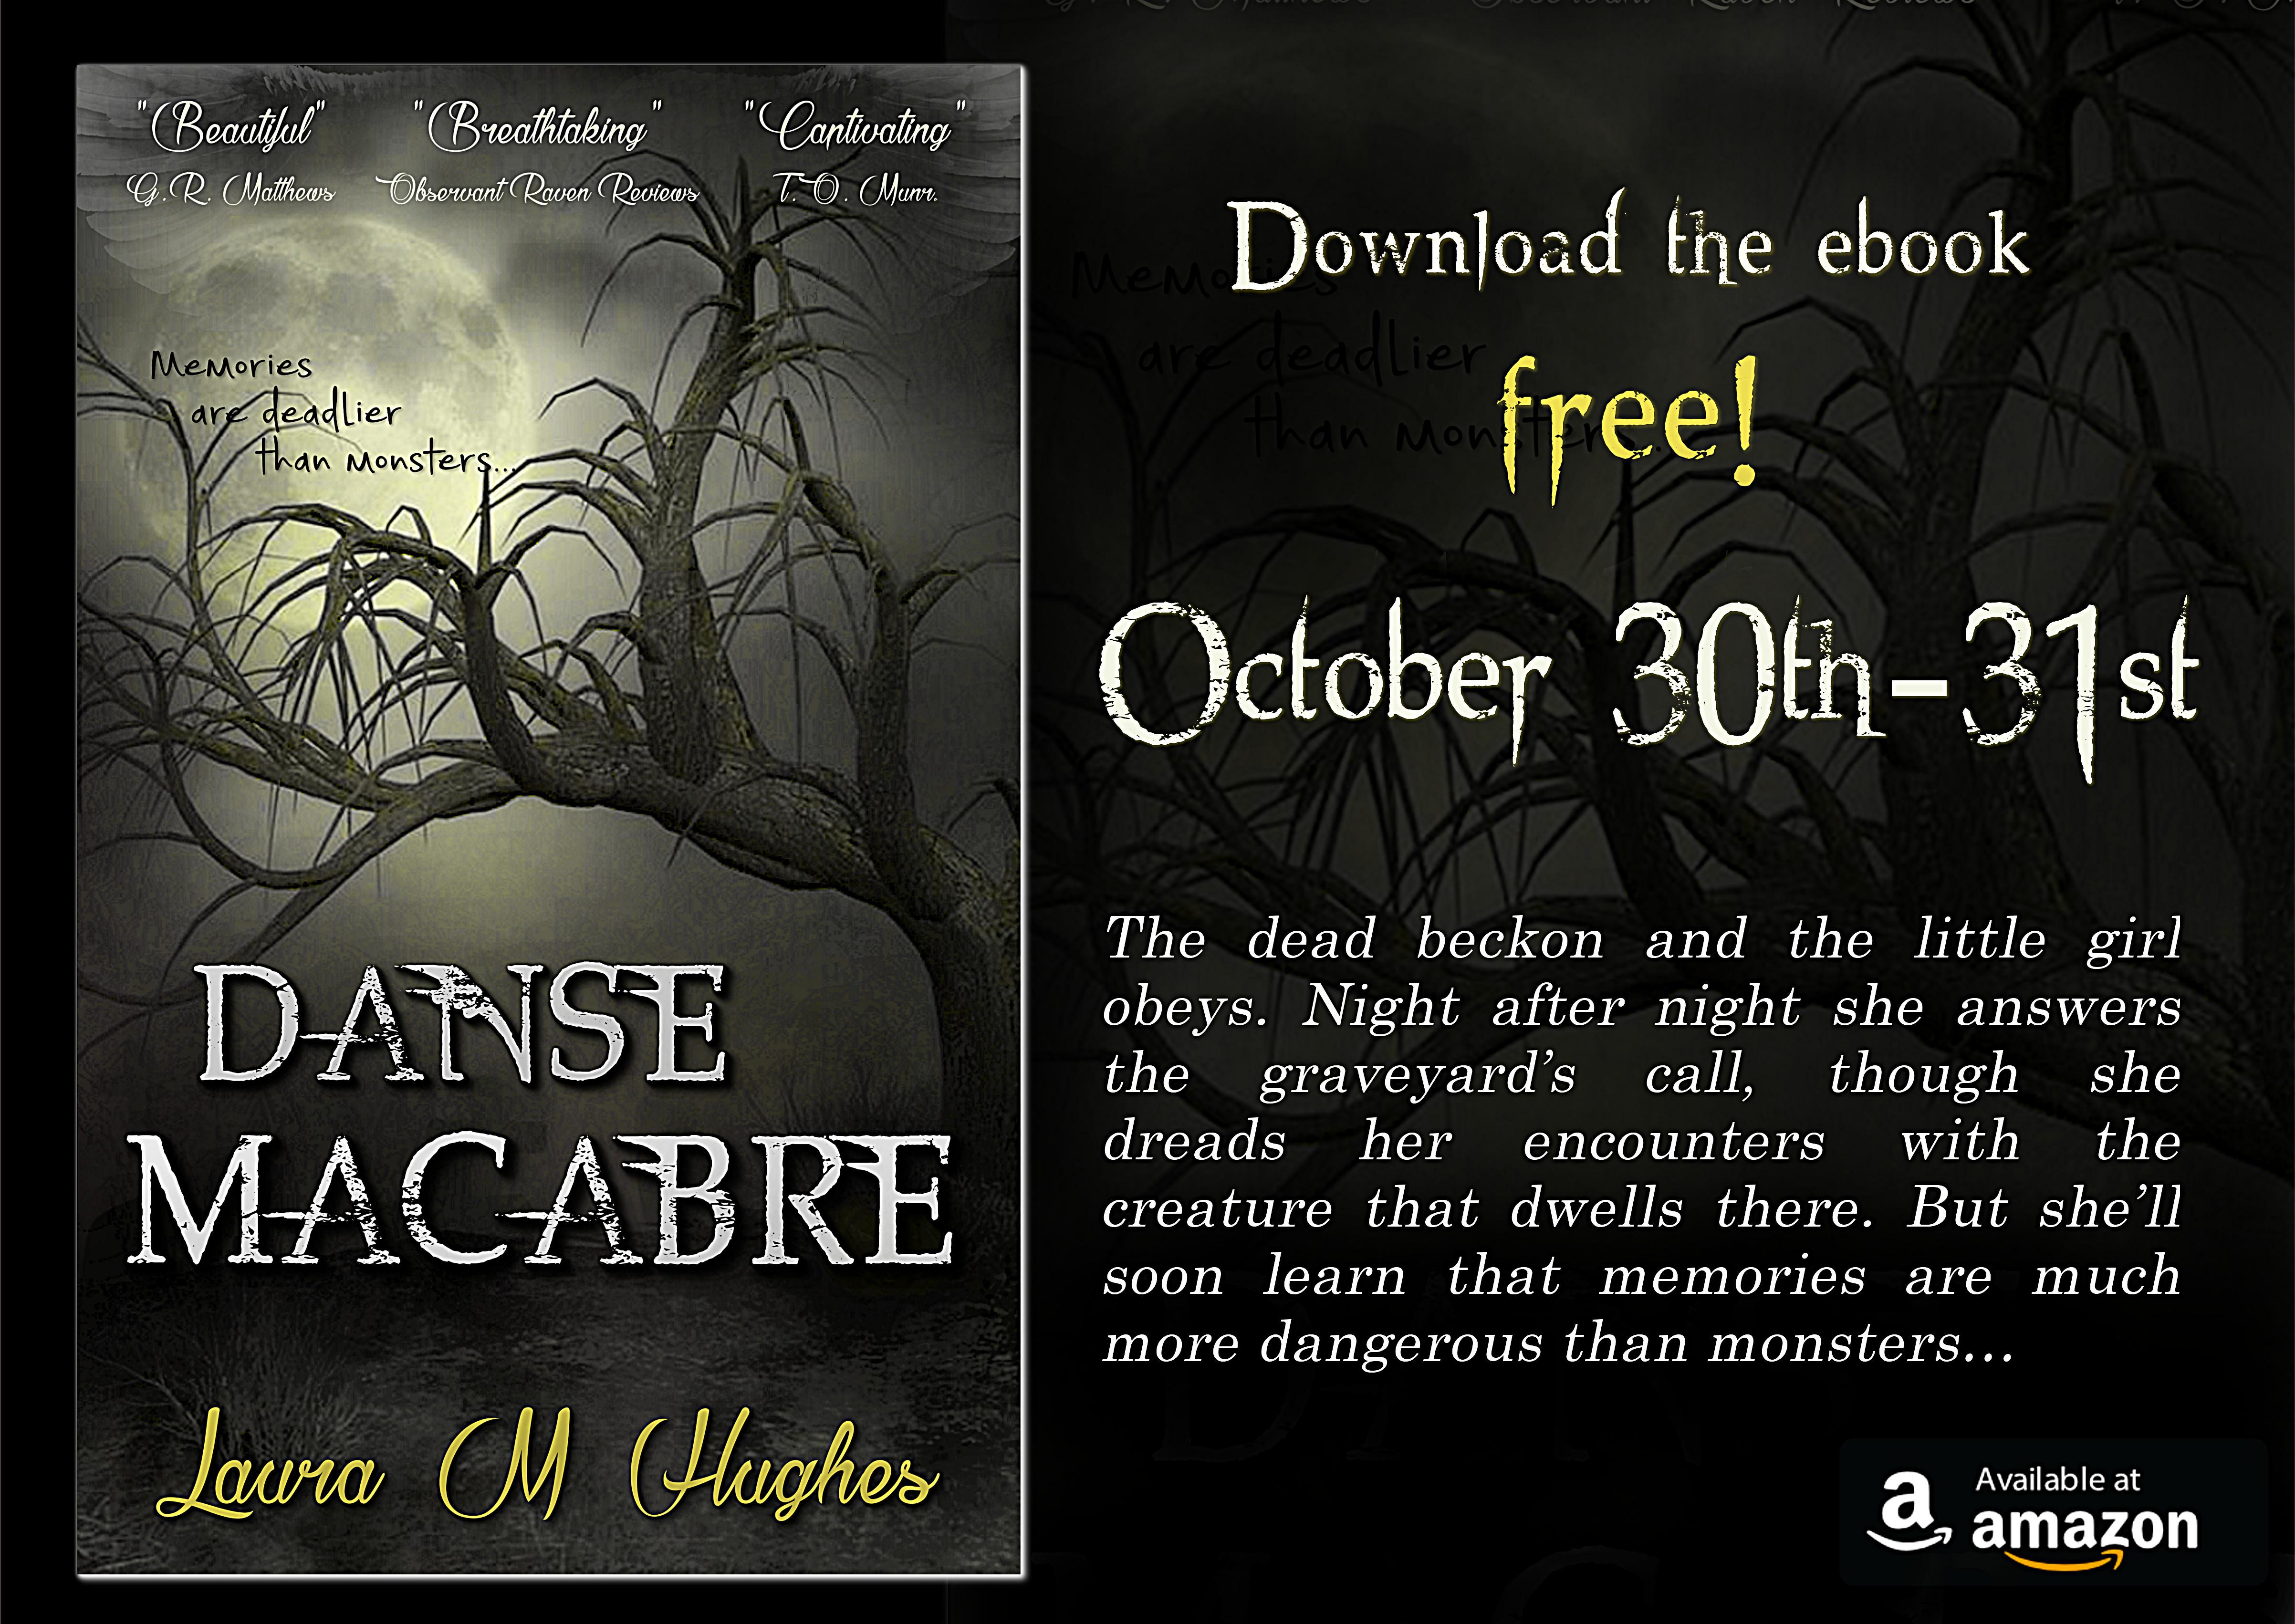 Danse Macabre - FREE for Halloween!